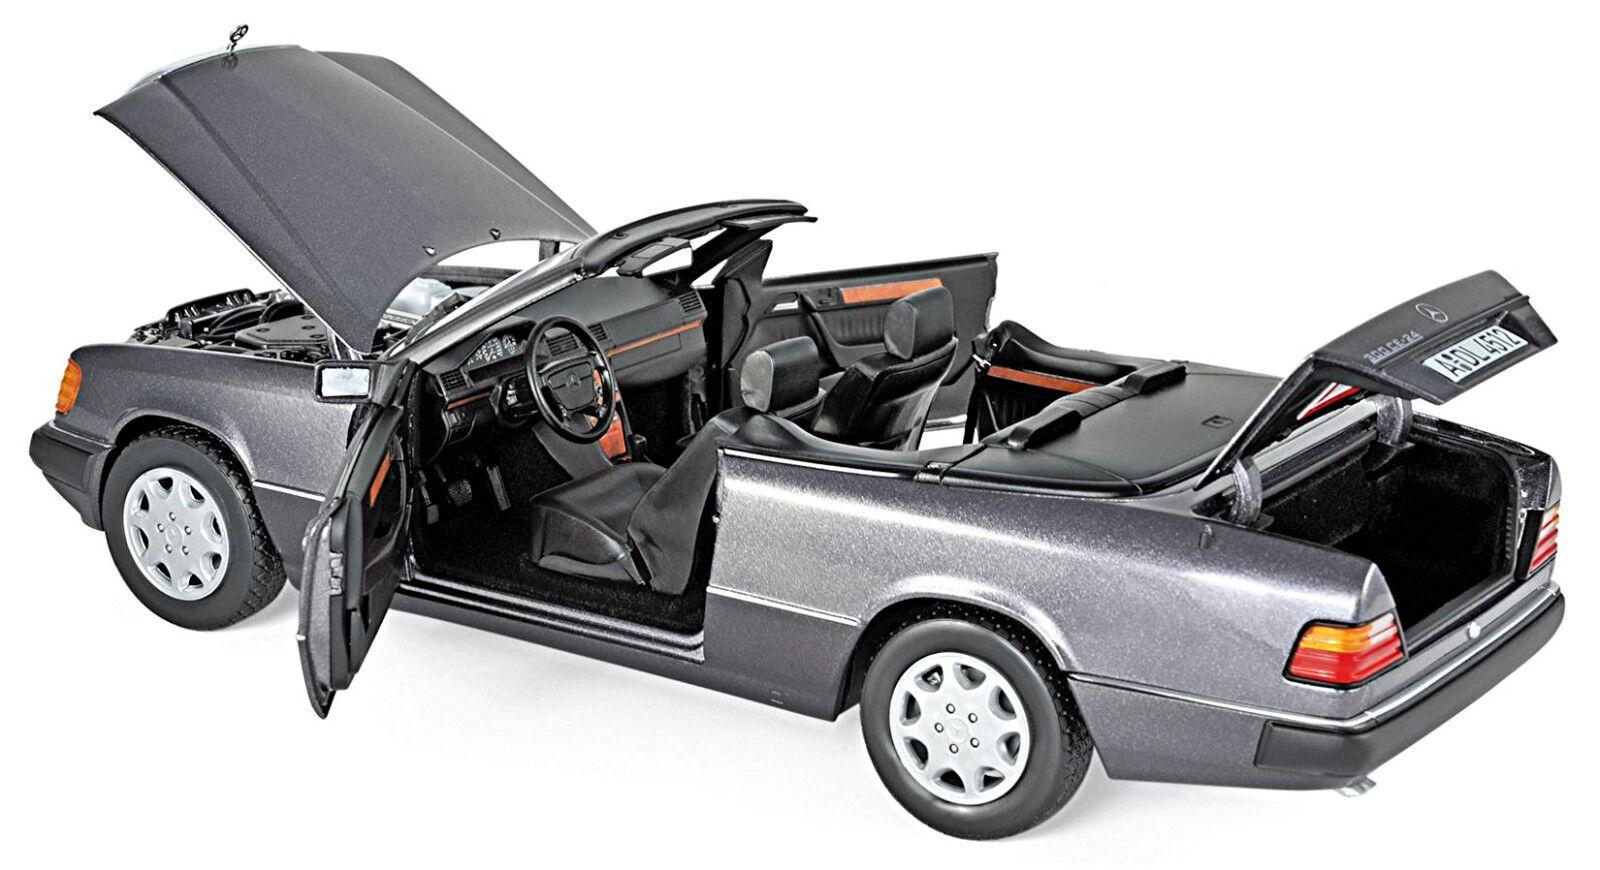 Mercedes-Benz 300 Ce a124 Cabriolet 1991-93 Bornite Métallisé 1 18 Norev